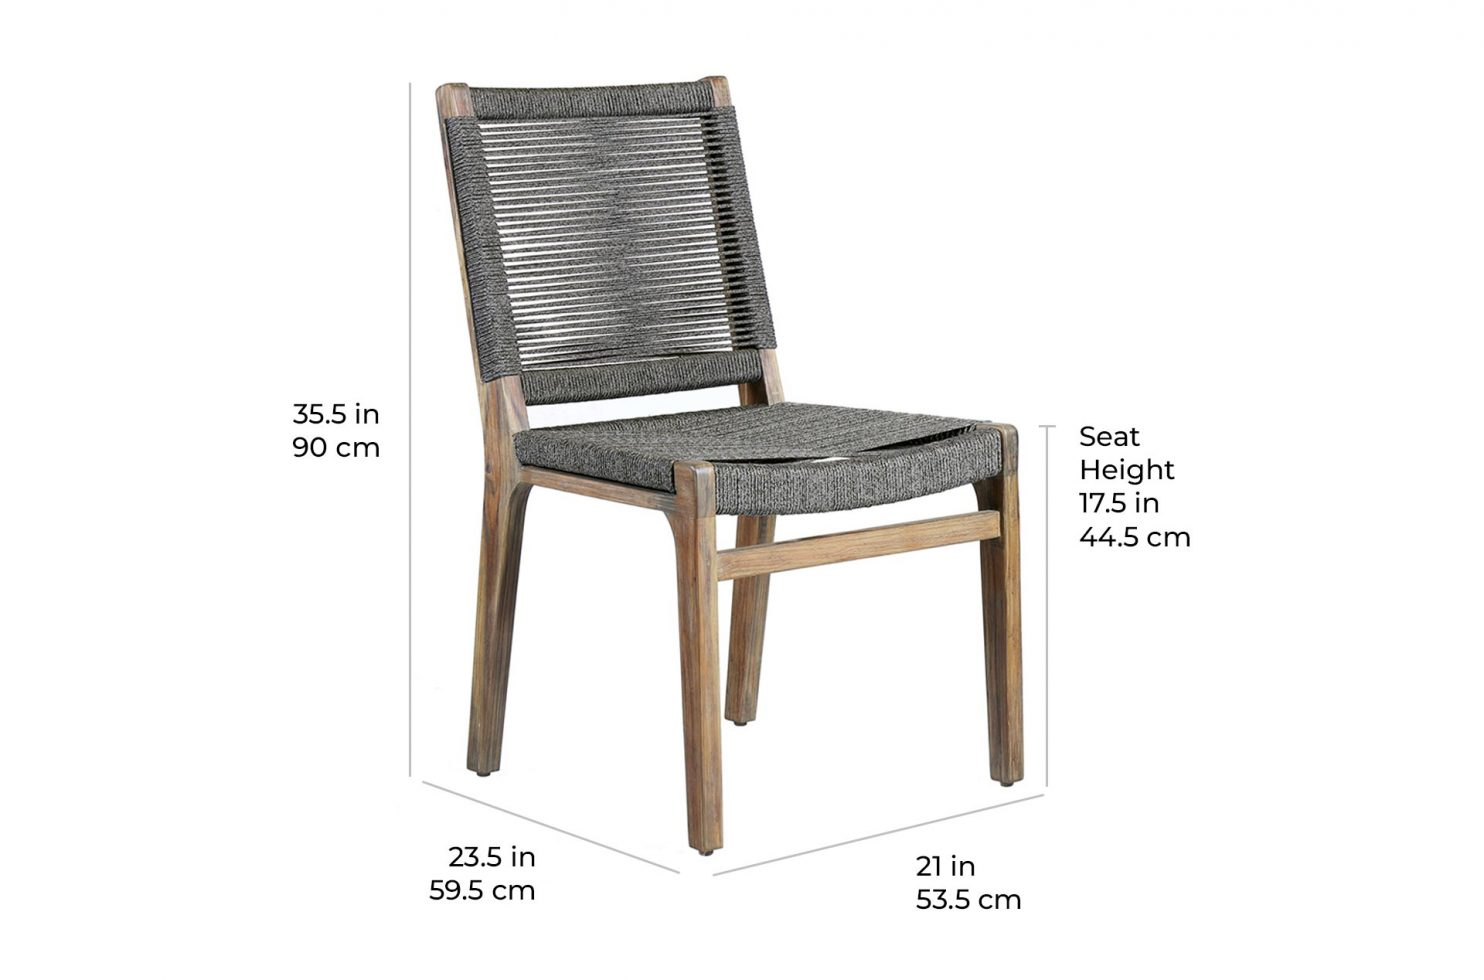 oceans side chair E50498031 scale dims